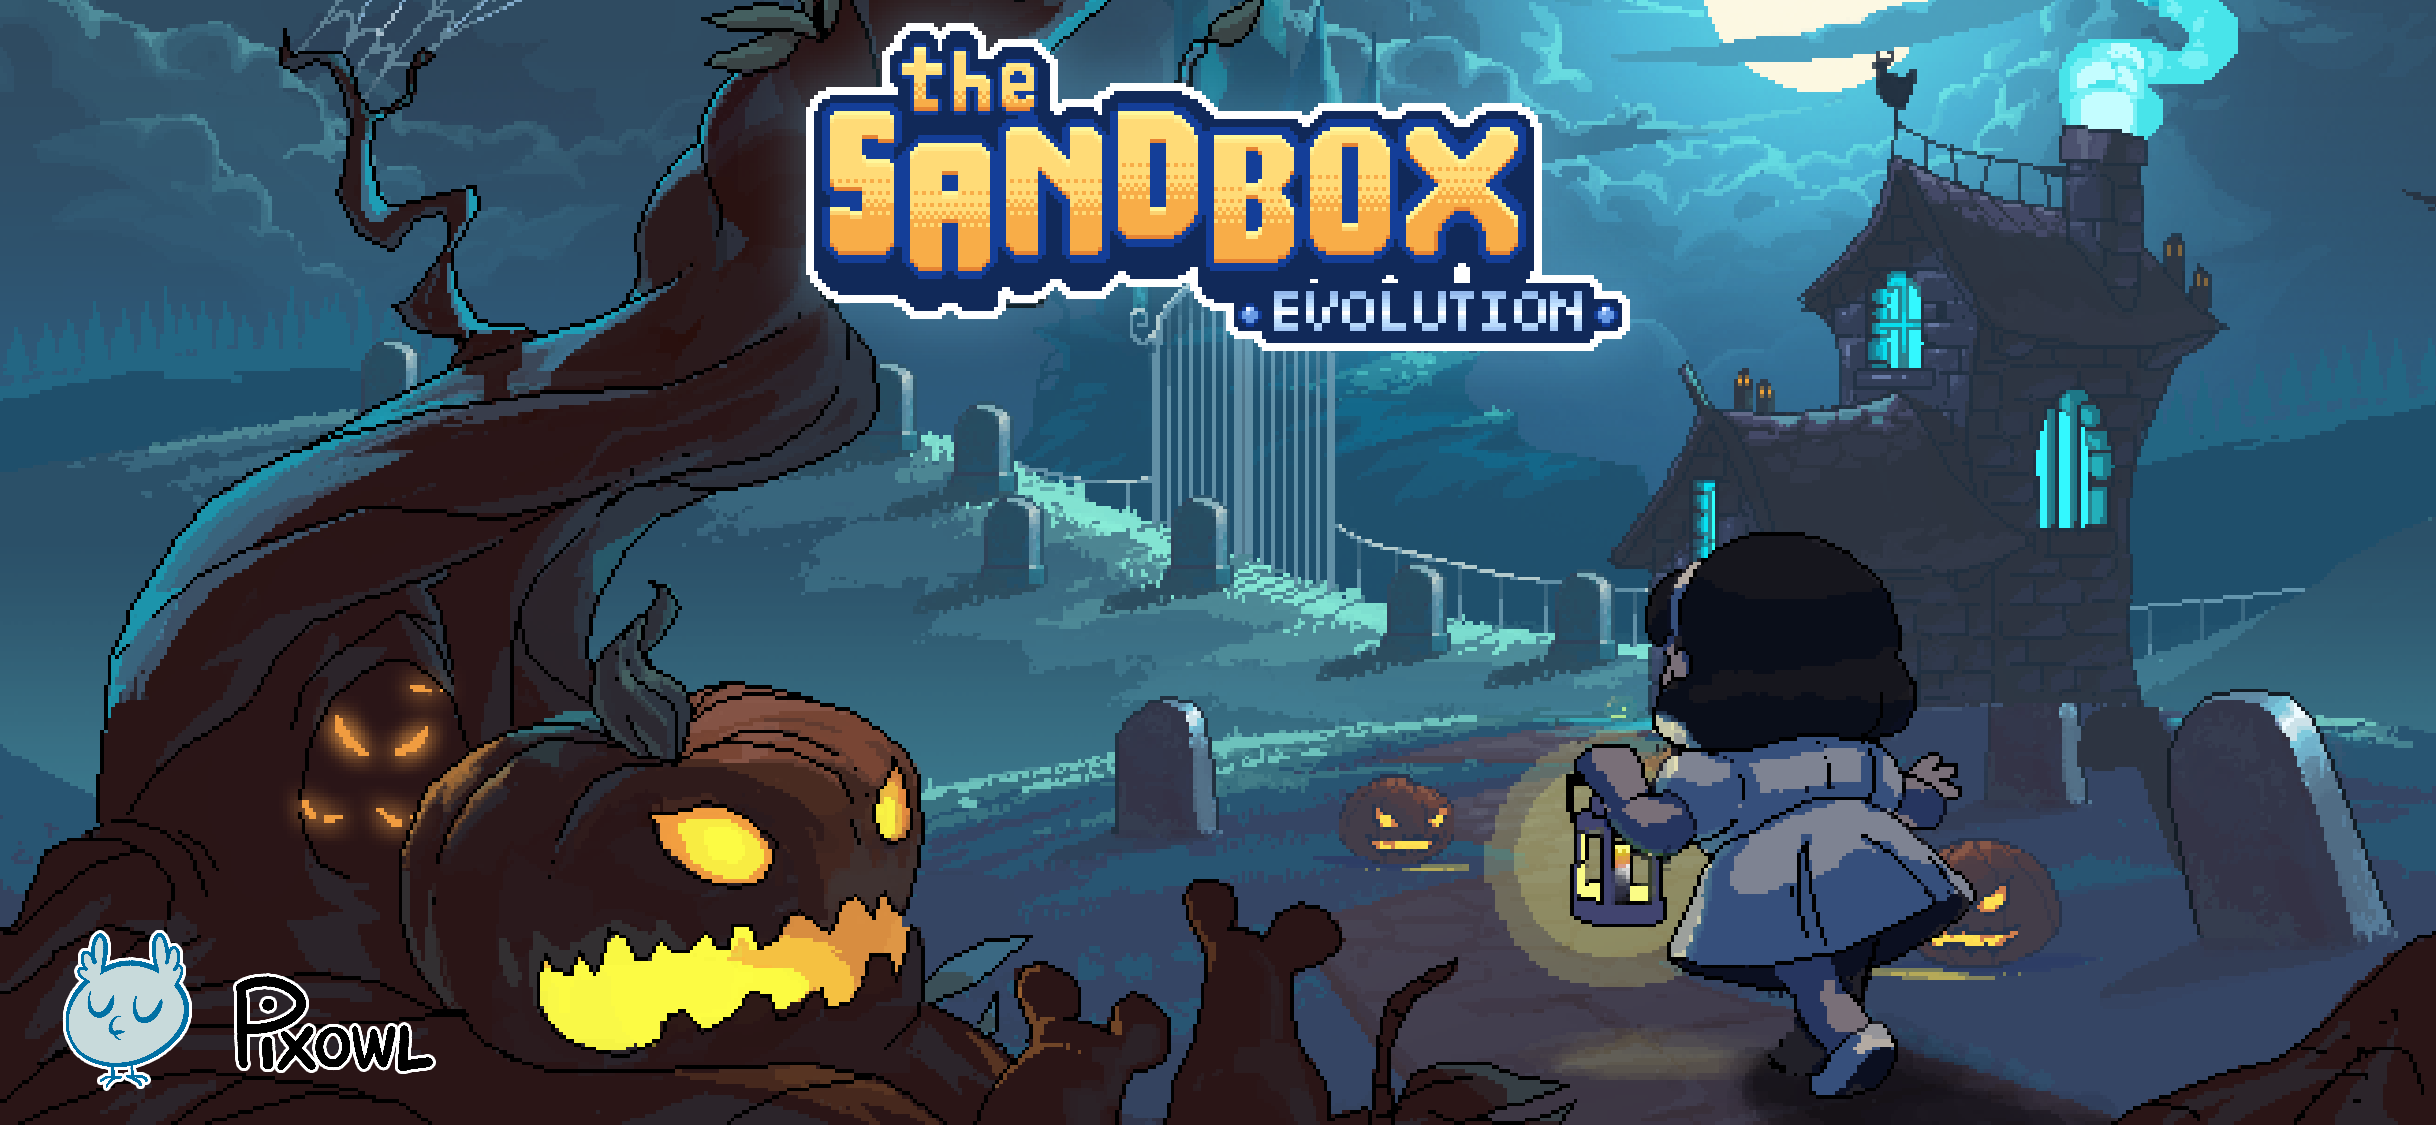 the sandbox evolution | Pixowl – Mobile Games Studio